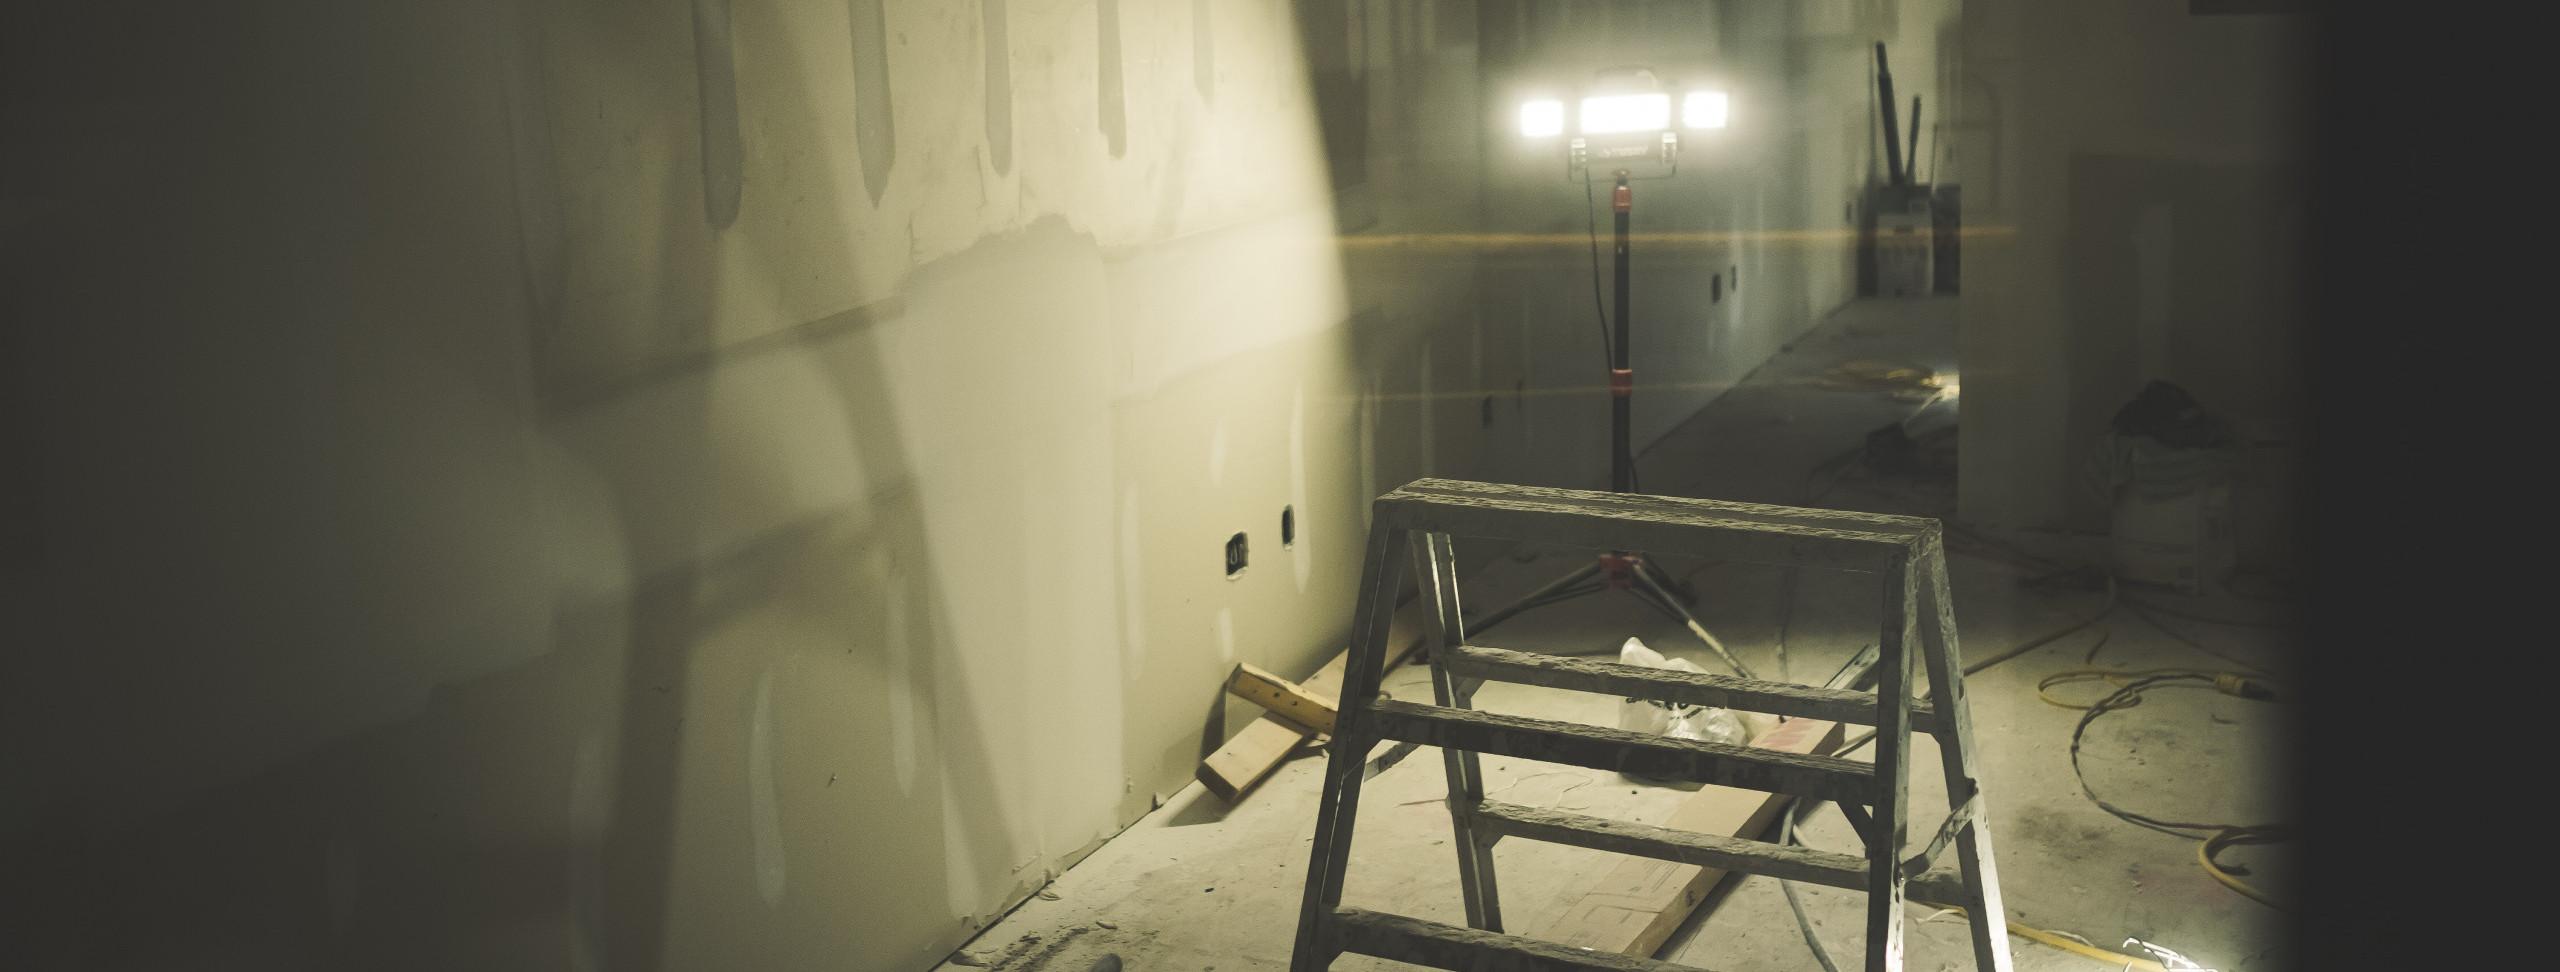 drywall-massa-parede-instalacao